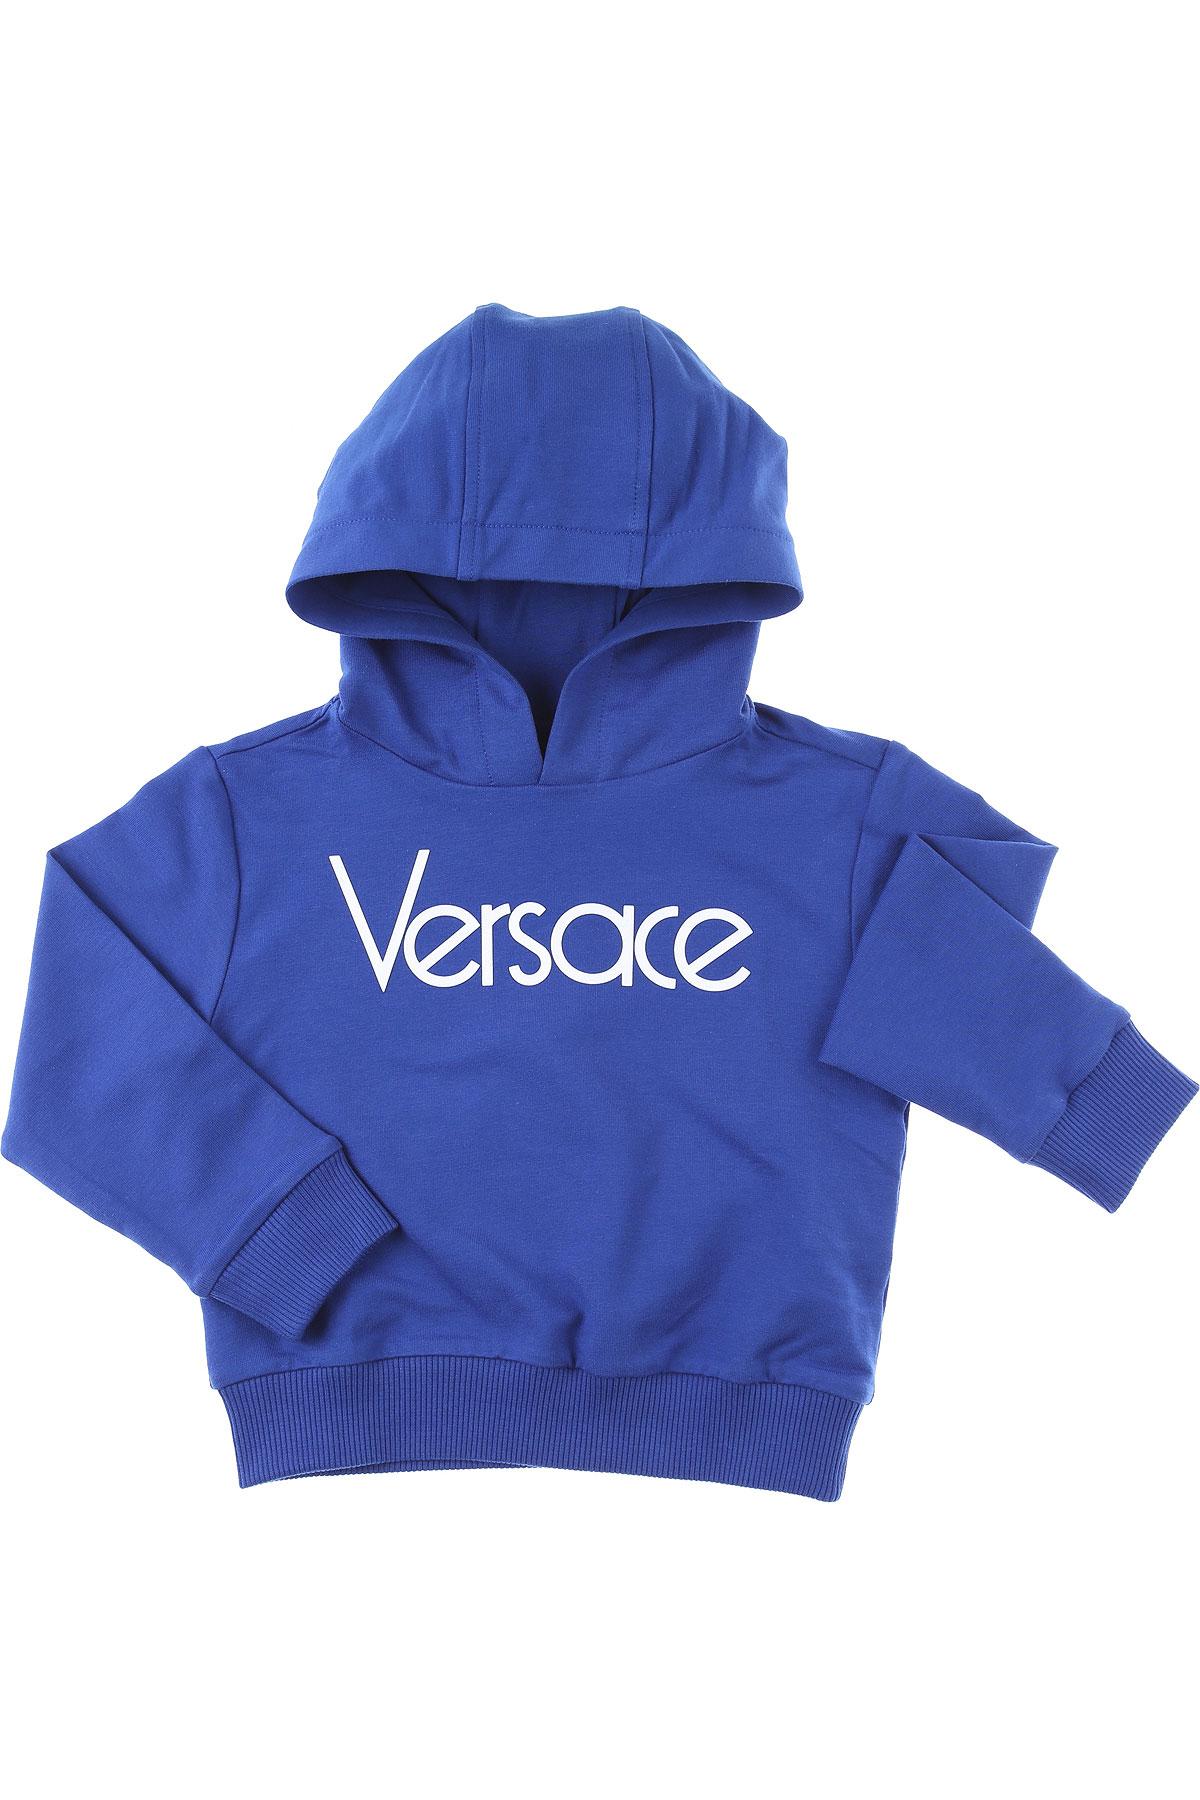 Versace Baby Sweatshirts & Hoodies for Boys On Sale, Blue, Cotton, 2019, 18M 24M 2Y 3Y